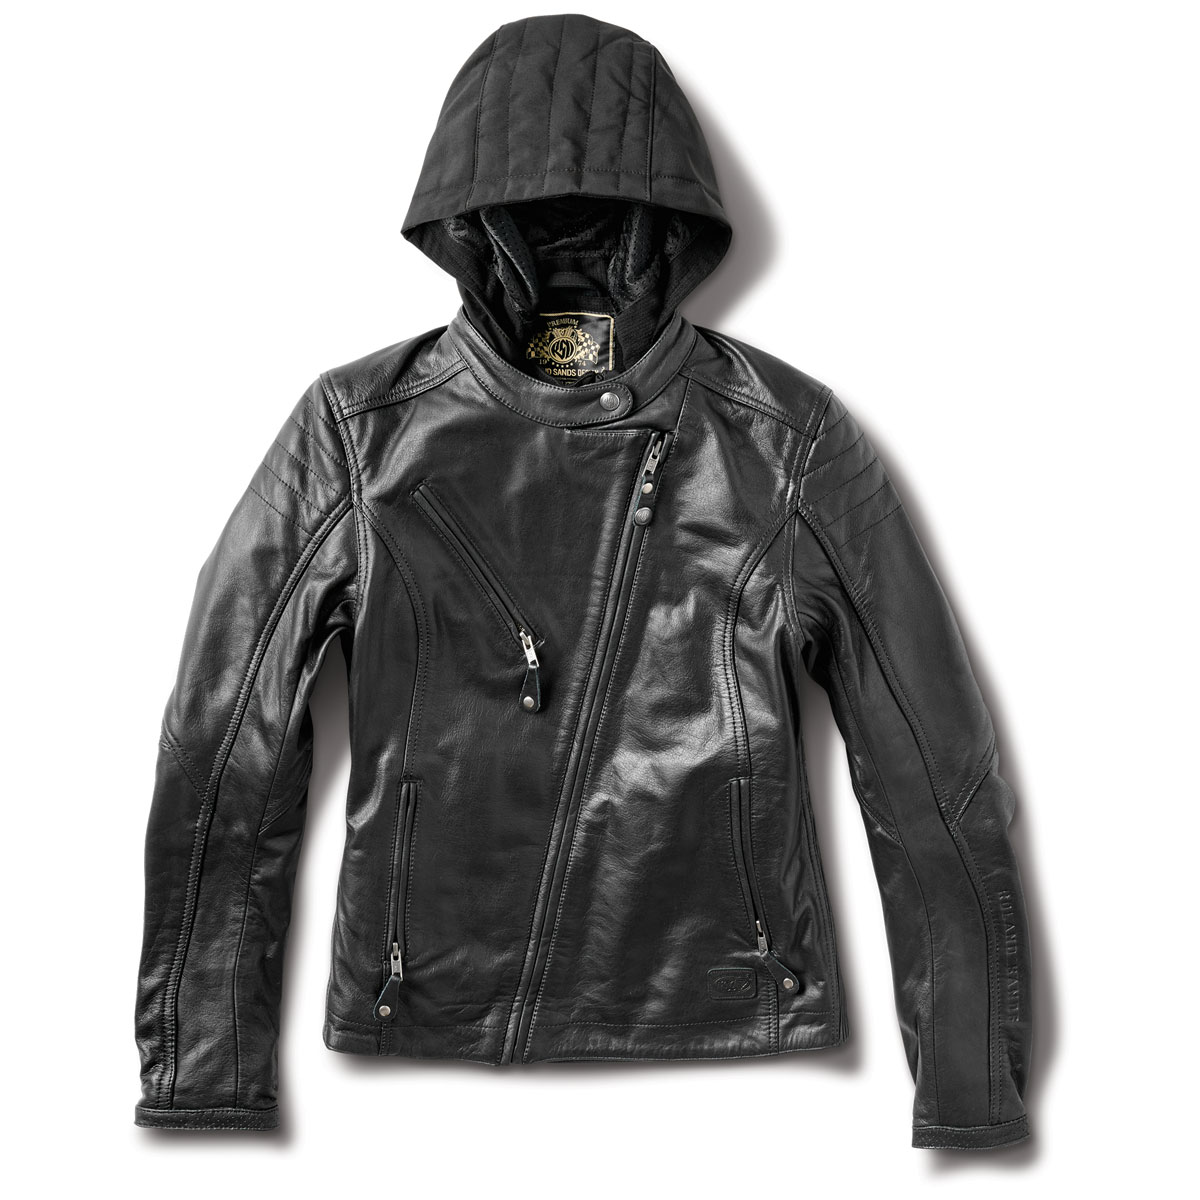 47e2df906 Roland Sands Design Apparel Women's Mia Black Leather Jacket - RD8841